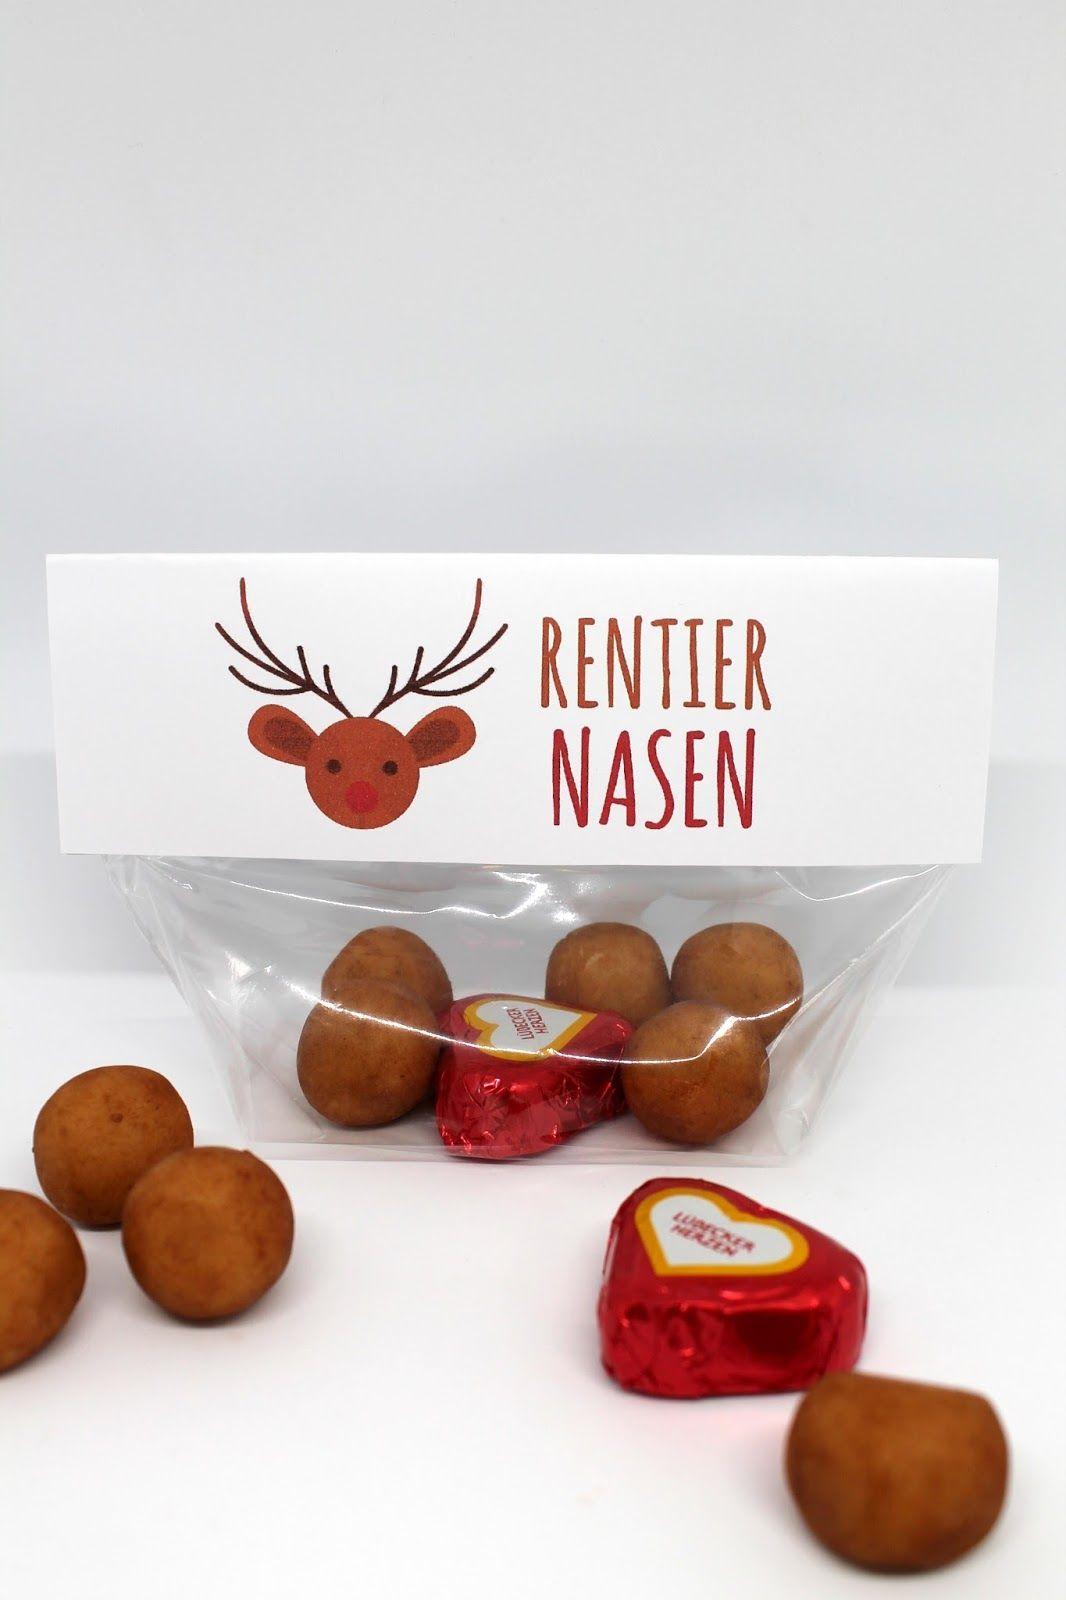 DIY Rentiernasen Weihnachtsgeschenk + Free Printable | Diys and Free ...